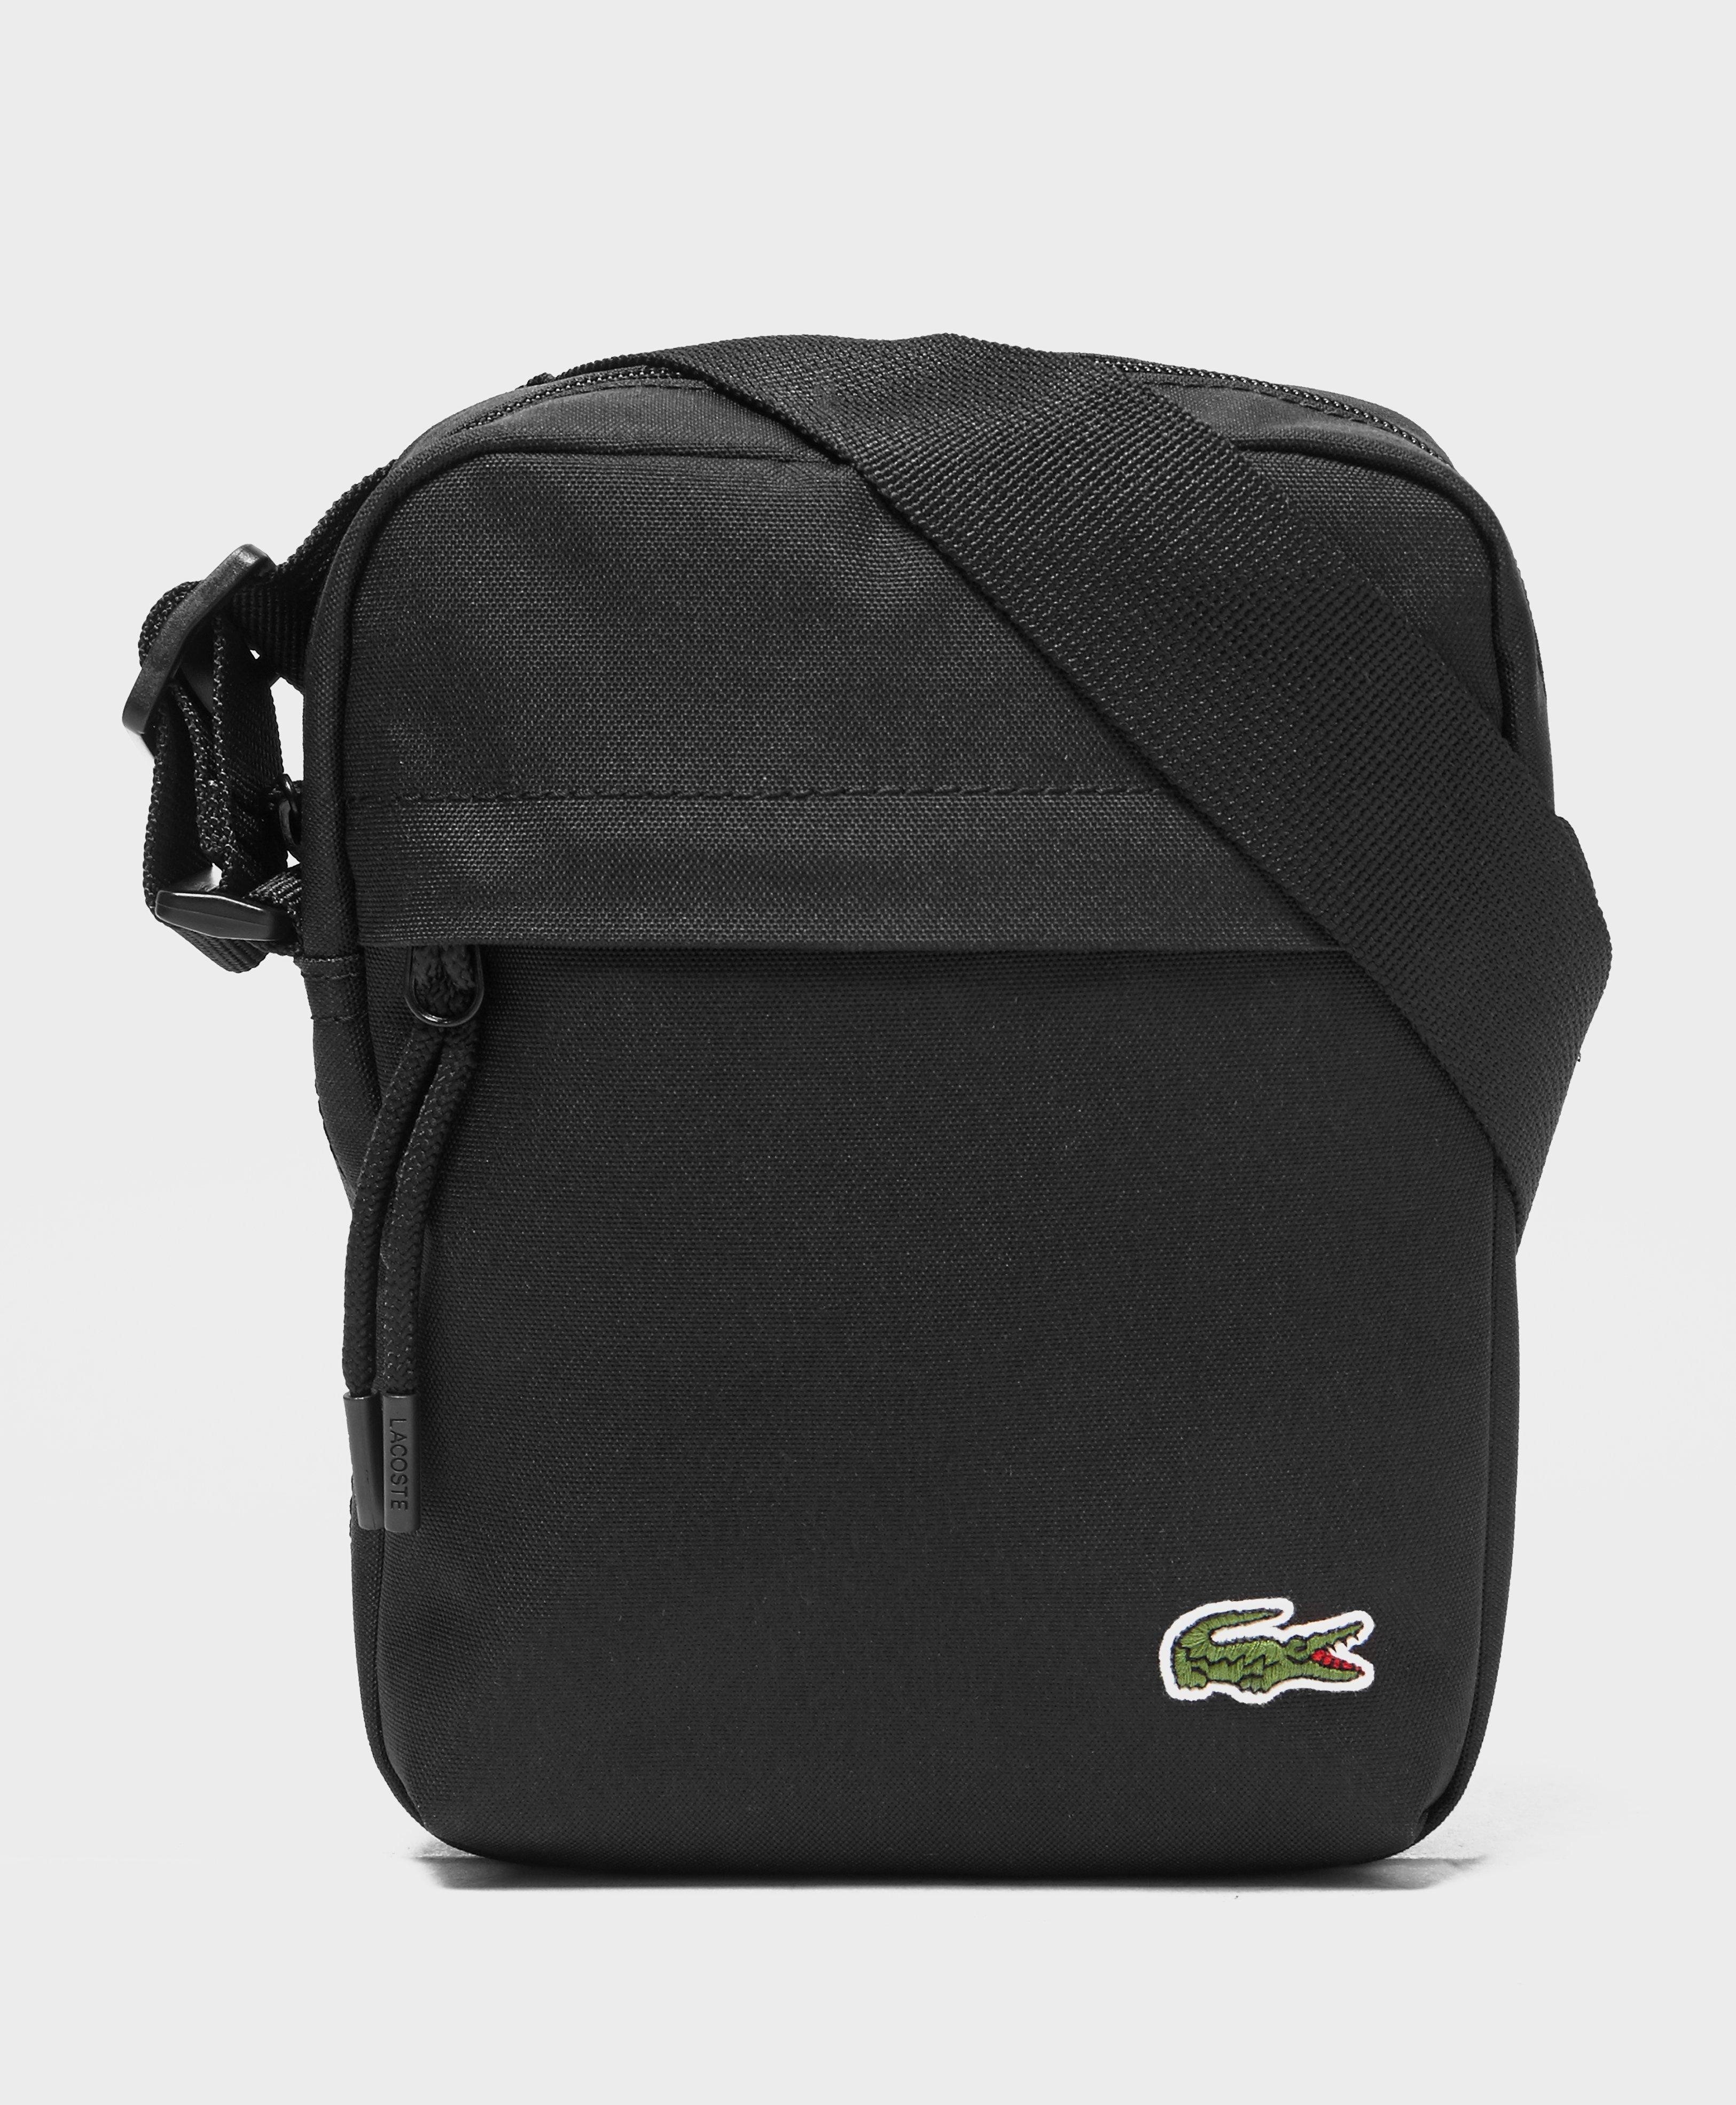 a57dfbb471 Lacoste Mini Bag in Black for Men - Lyst